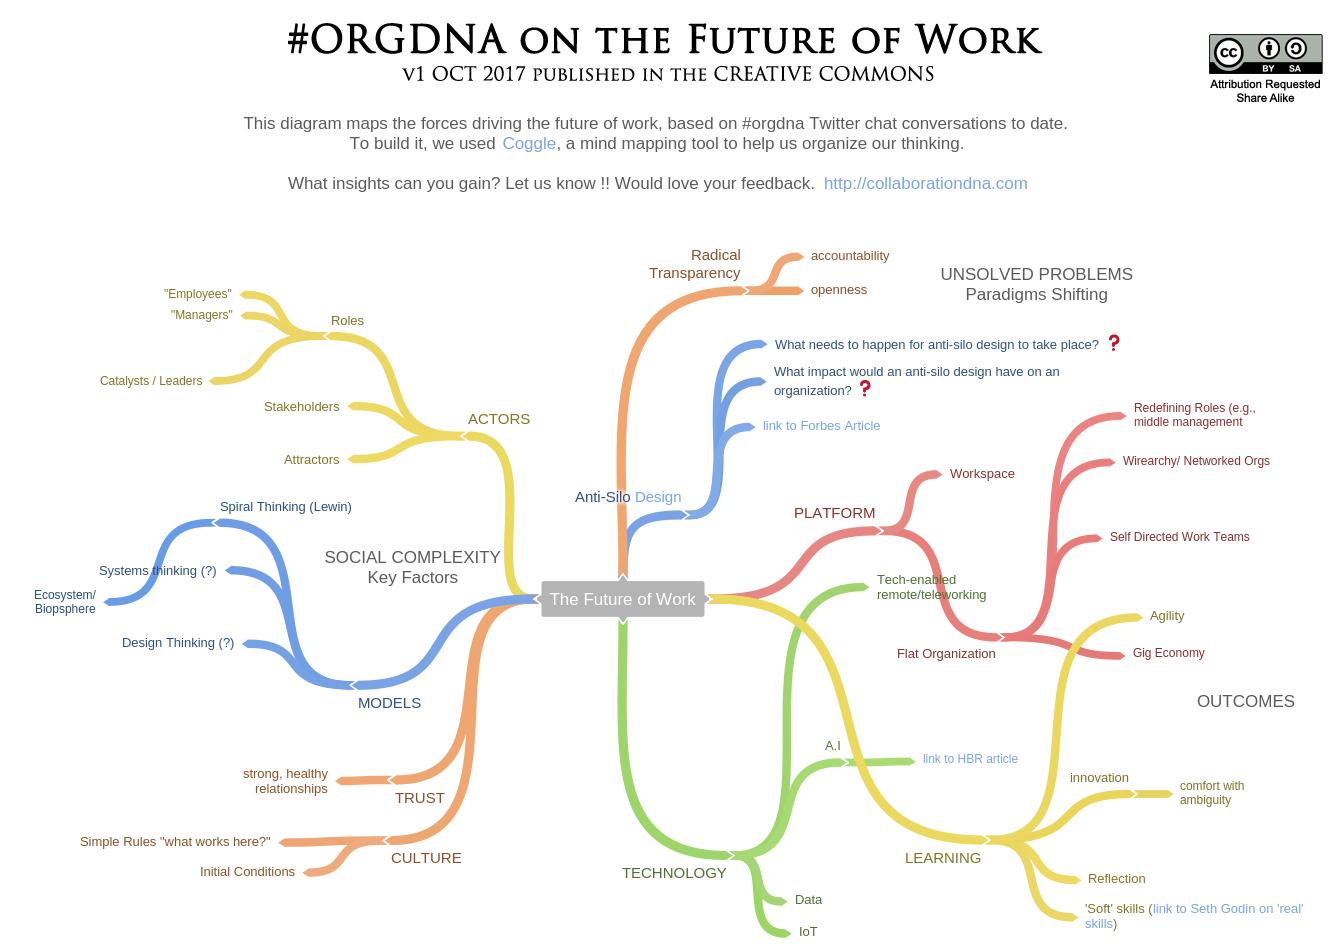 ORGDNA_FutureOfWork-v1-OCT2017